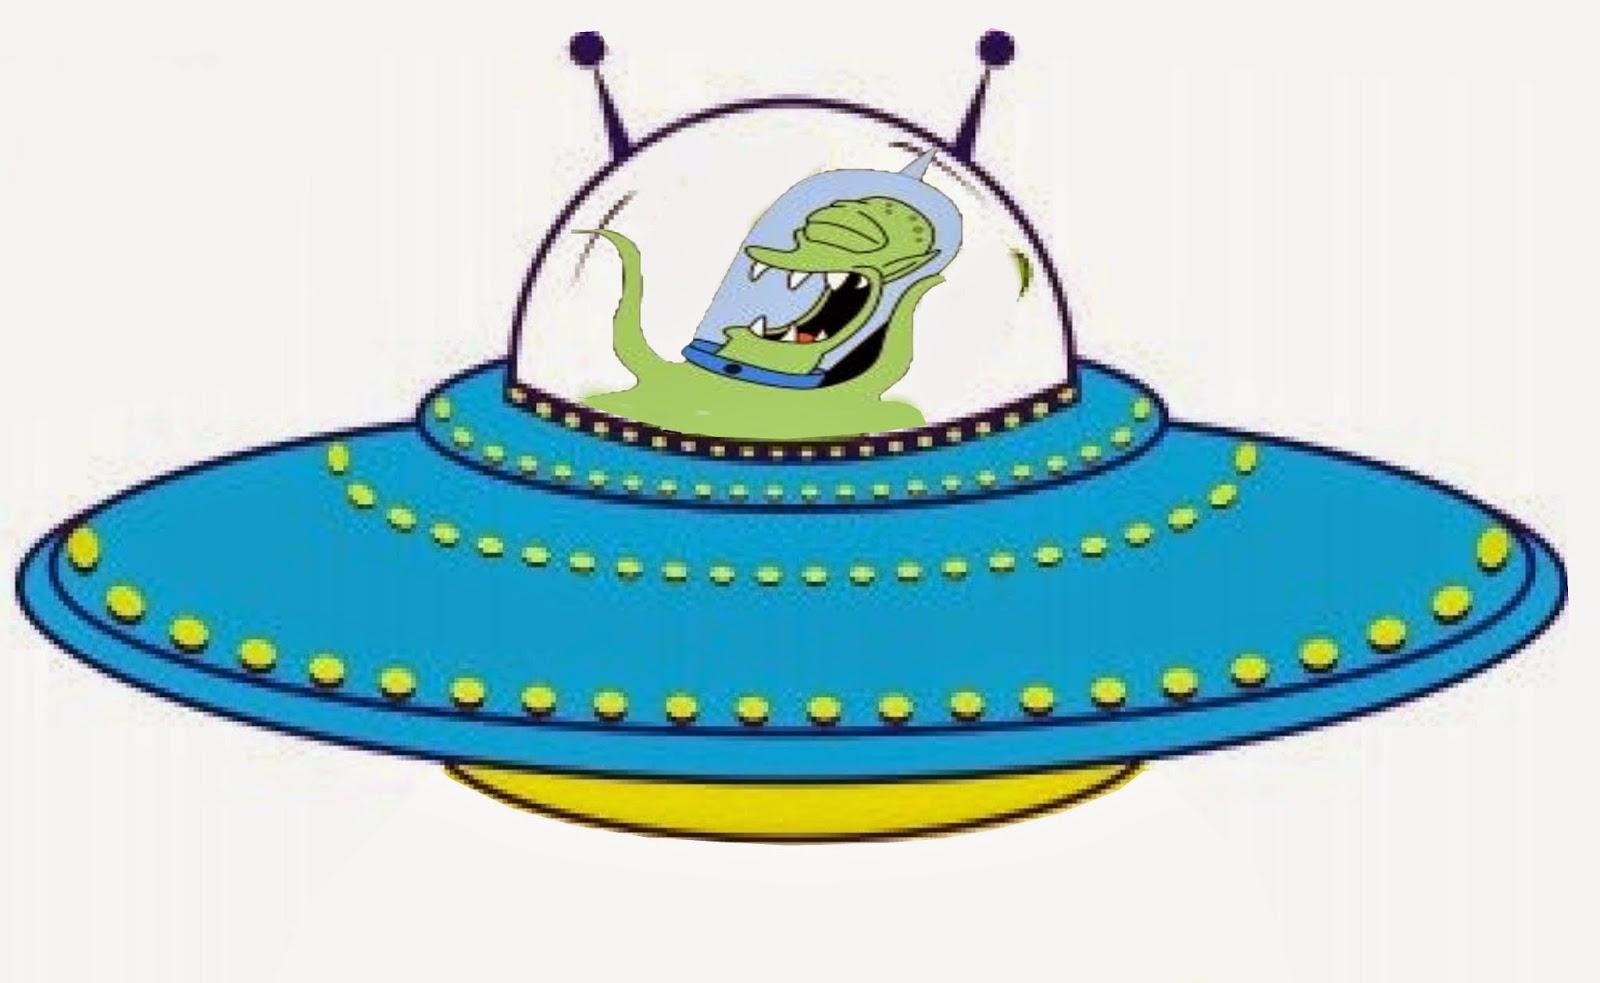 Kitchen Backsplash Blue Imagenes Extraterrestres Caricaturas Imagenes